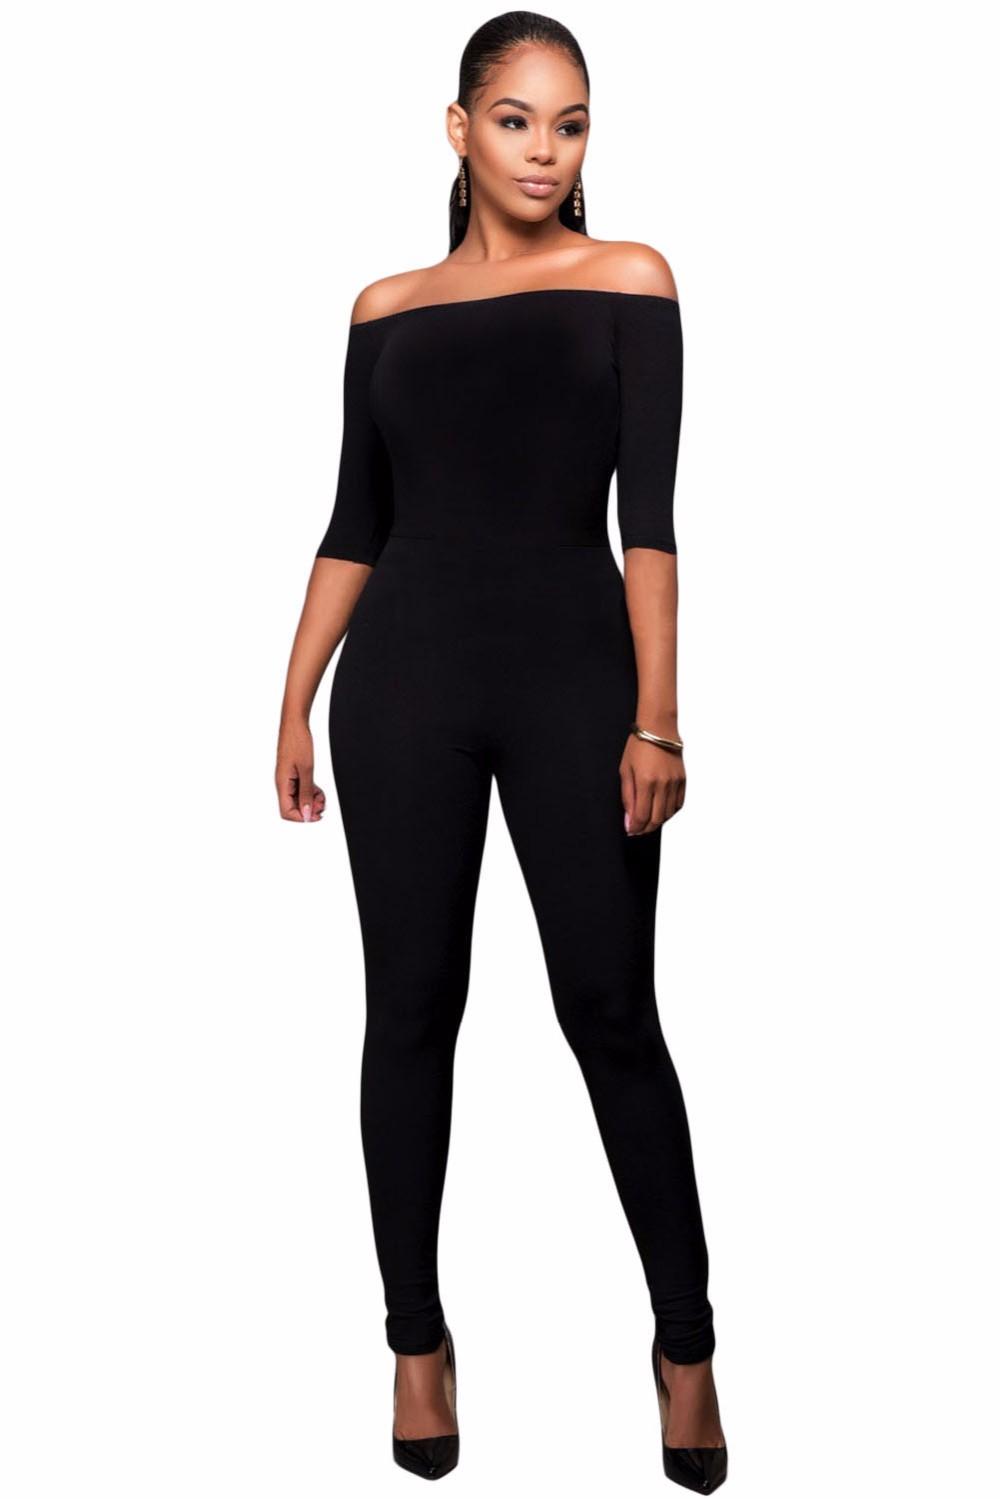 Black-Bardot-Neckline-Fashion-Jumpsuit-LC64193-2-1